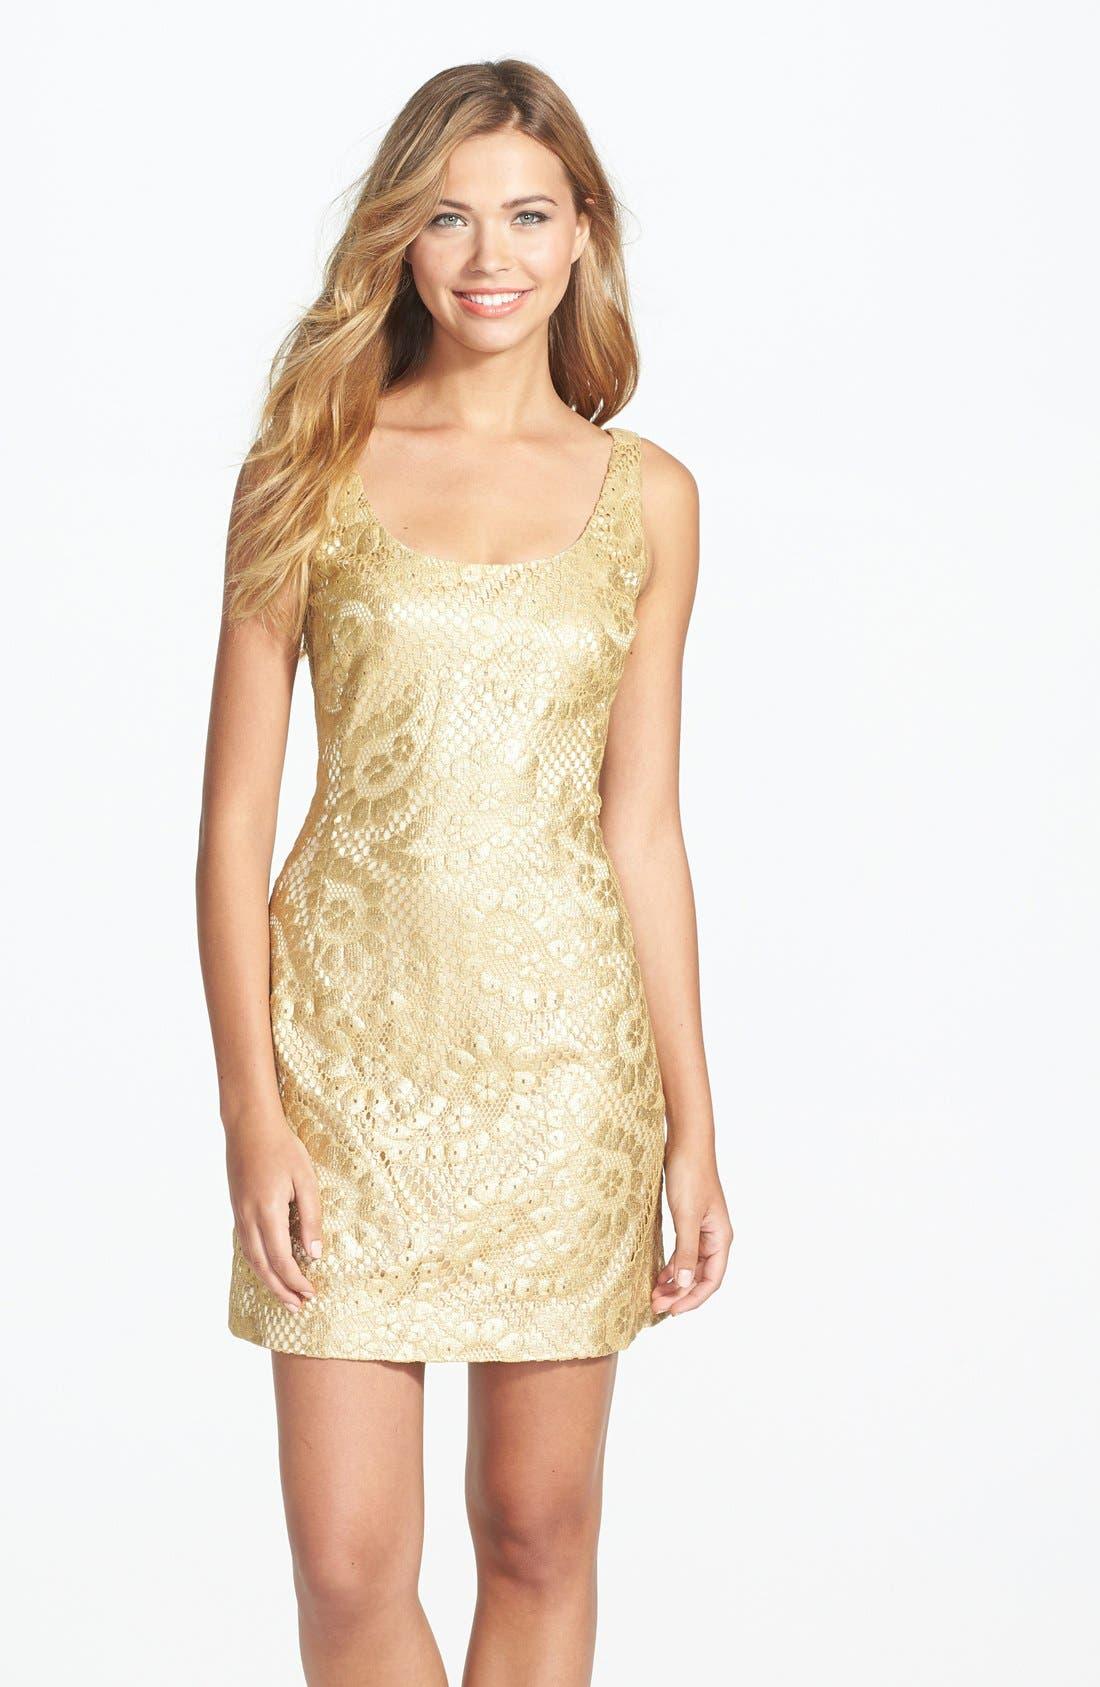 Main Image - Lilly Pulitzer® 'Eaton' Metallic Paisley Shift Dress